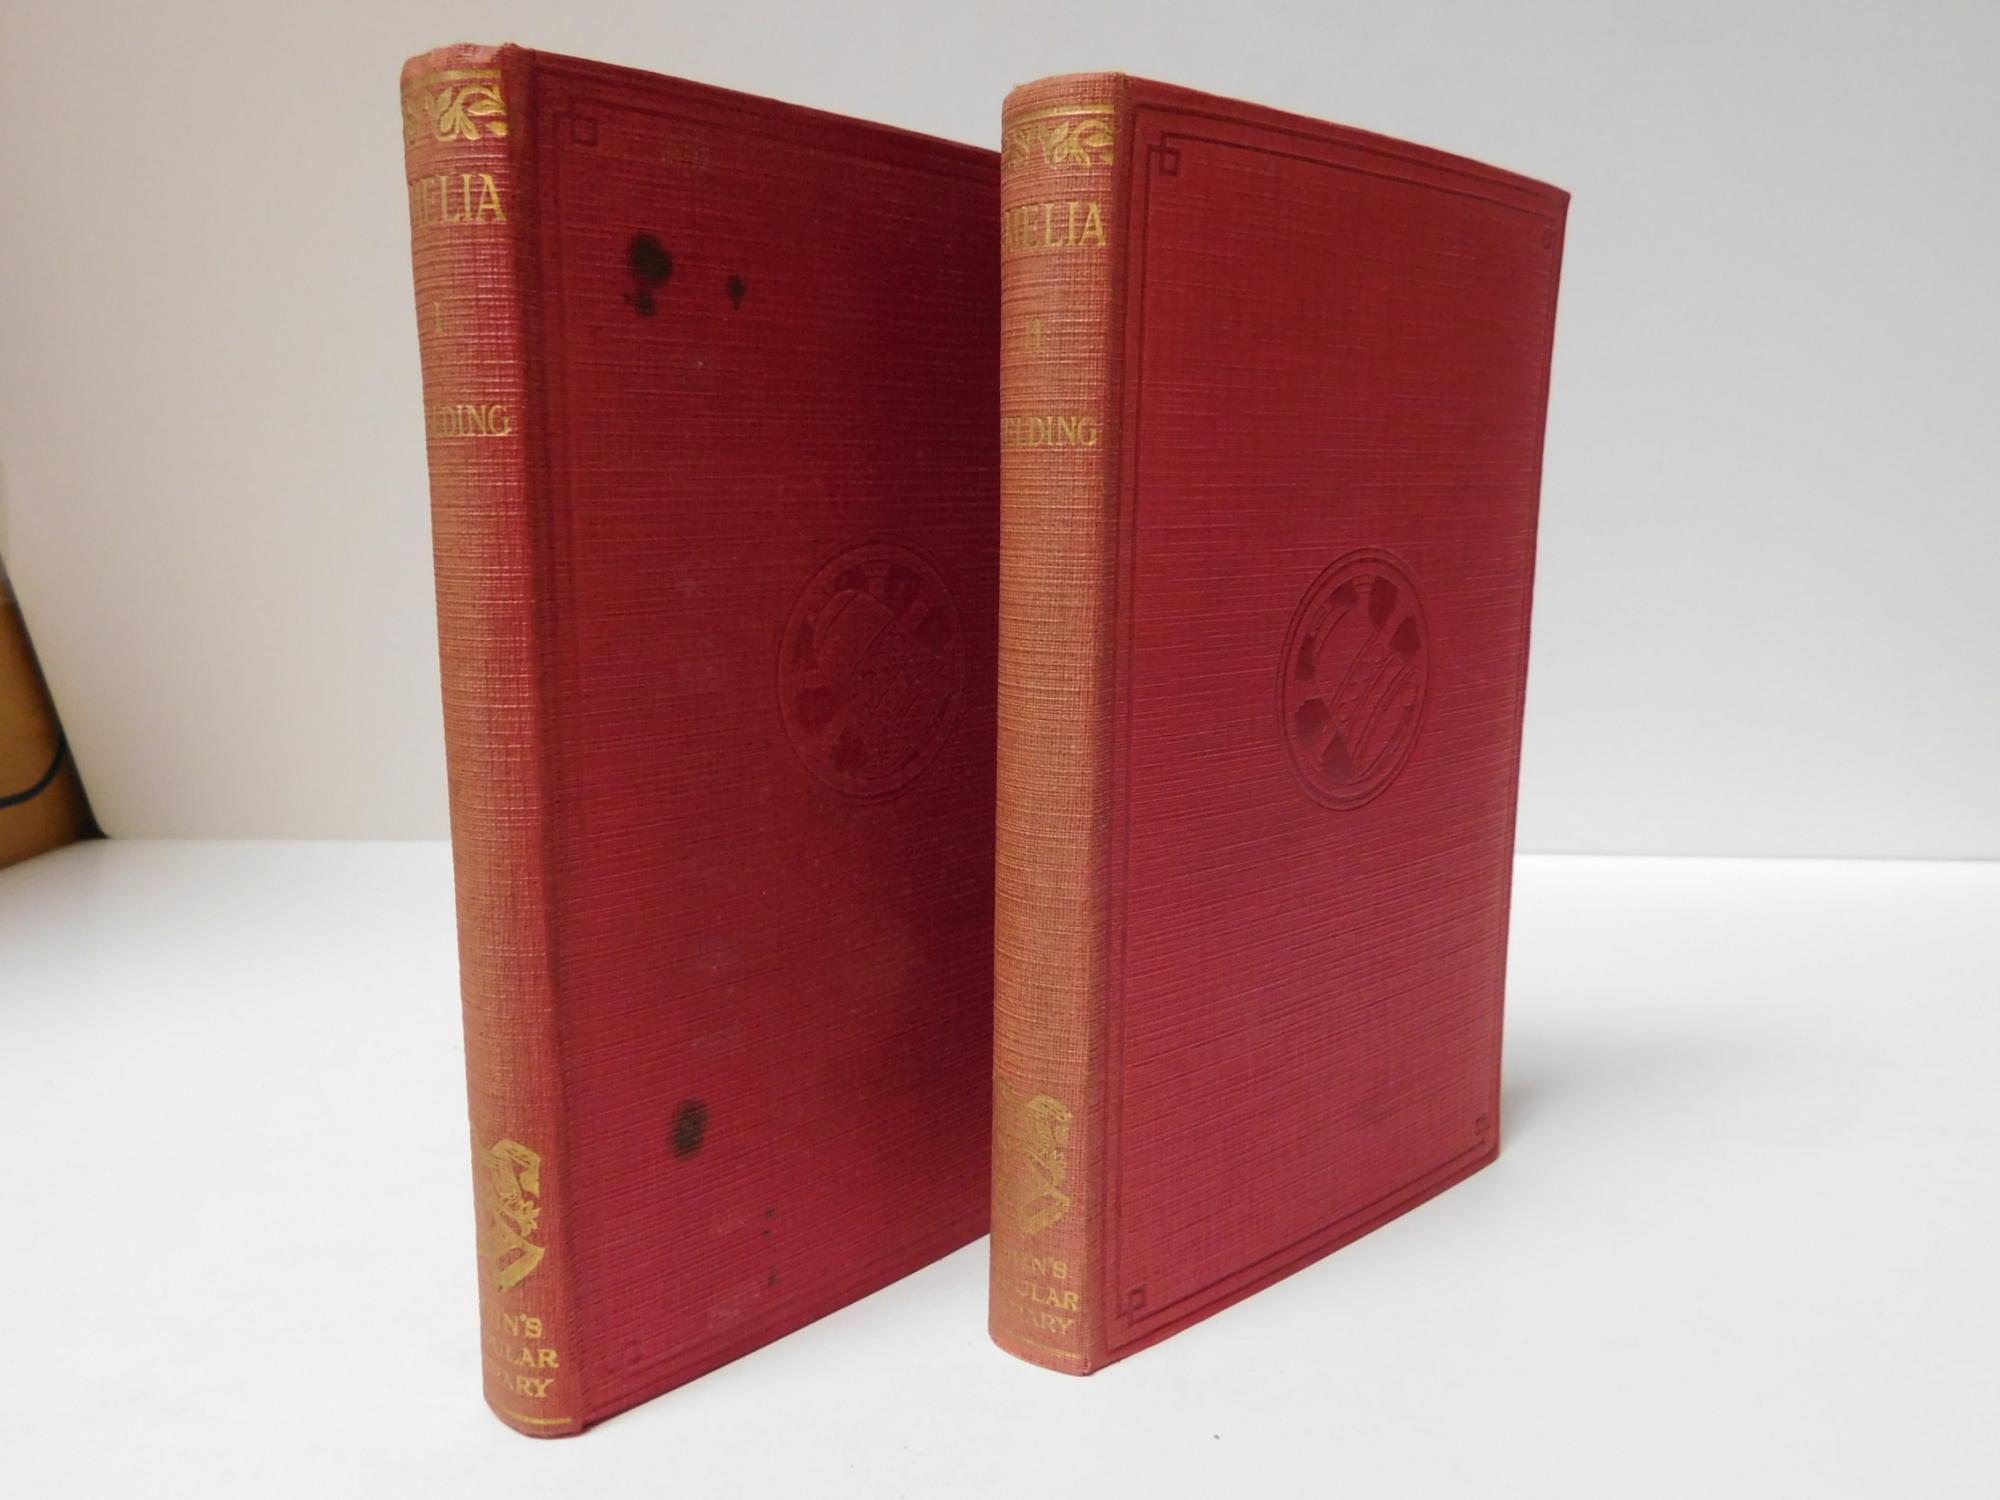 Amelia ( in Two Volumes Originally printed in 1751, in one volume) Henry Fielding Hardcover